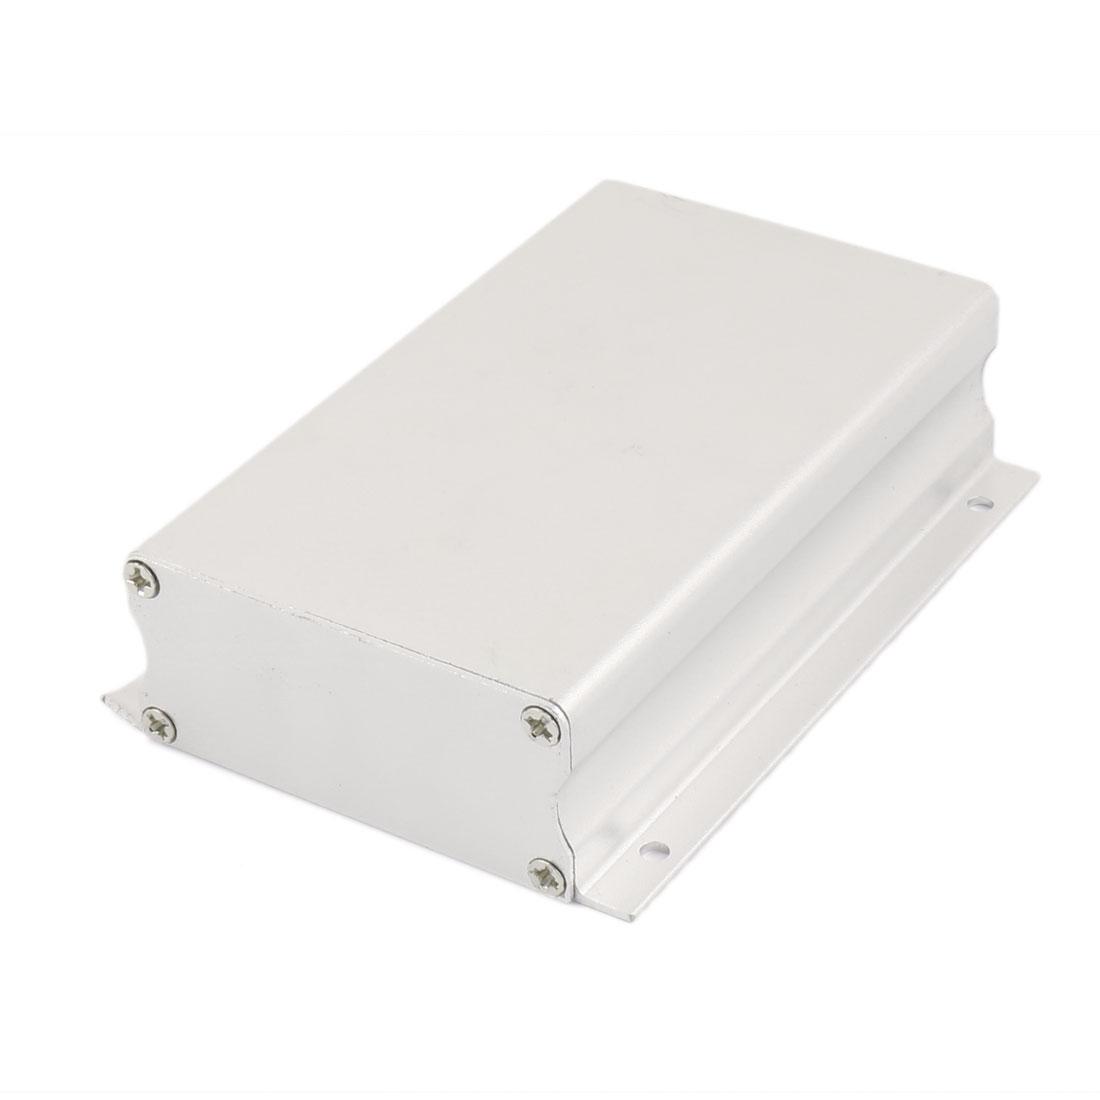 112 x 81 x 29mm Multi-purpose Electronic Extruded Aluminum Enclosure Silver Tone